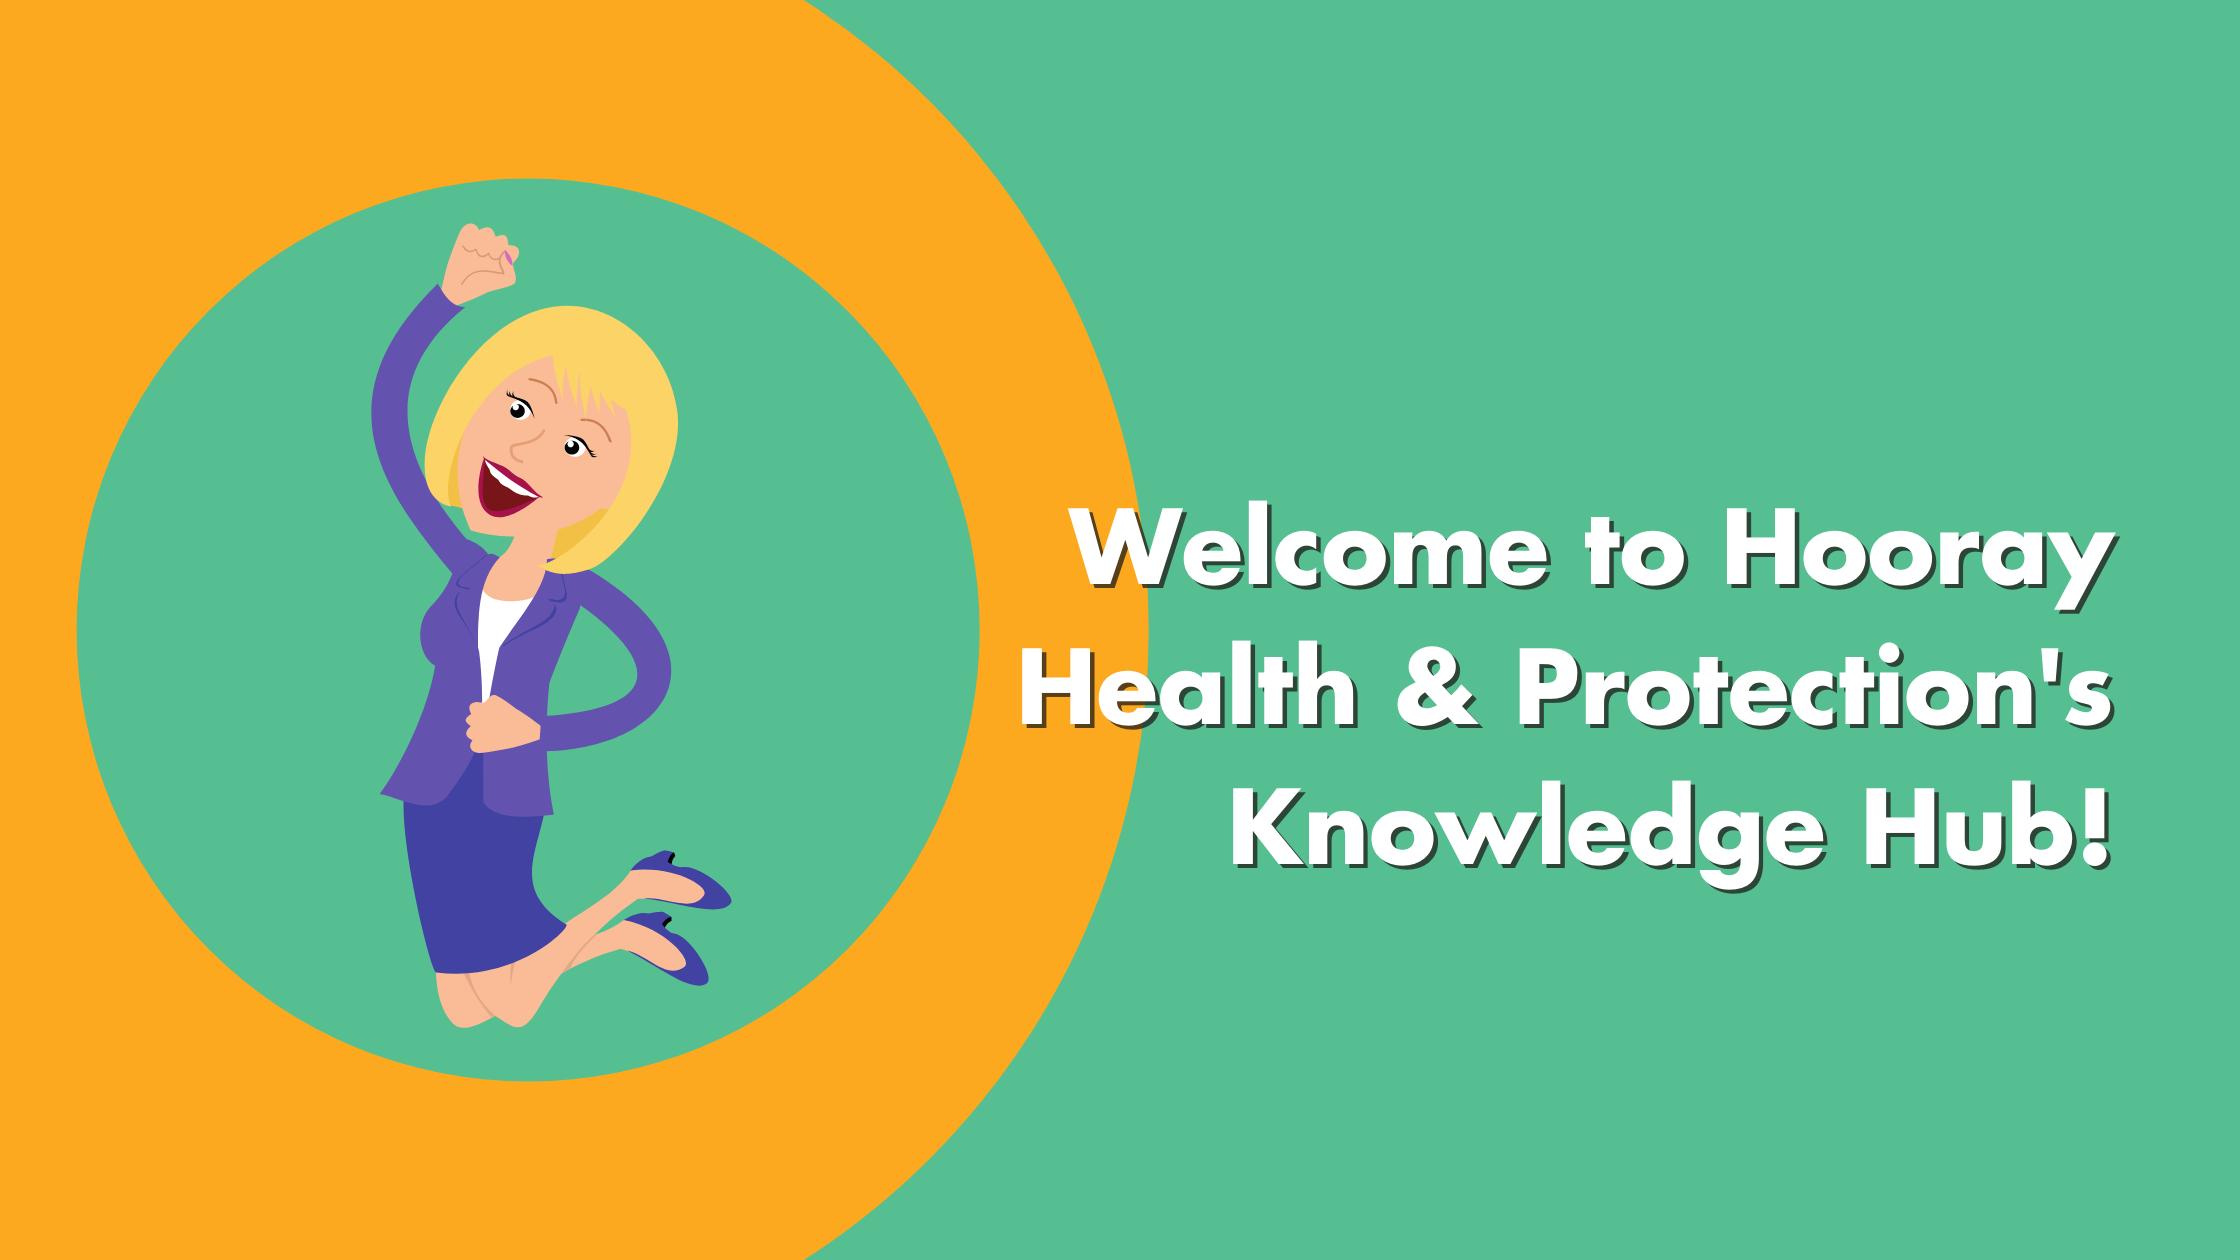 Hooray Health & Protection Knowledge Hub